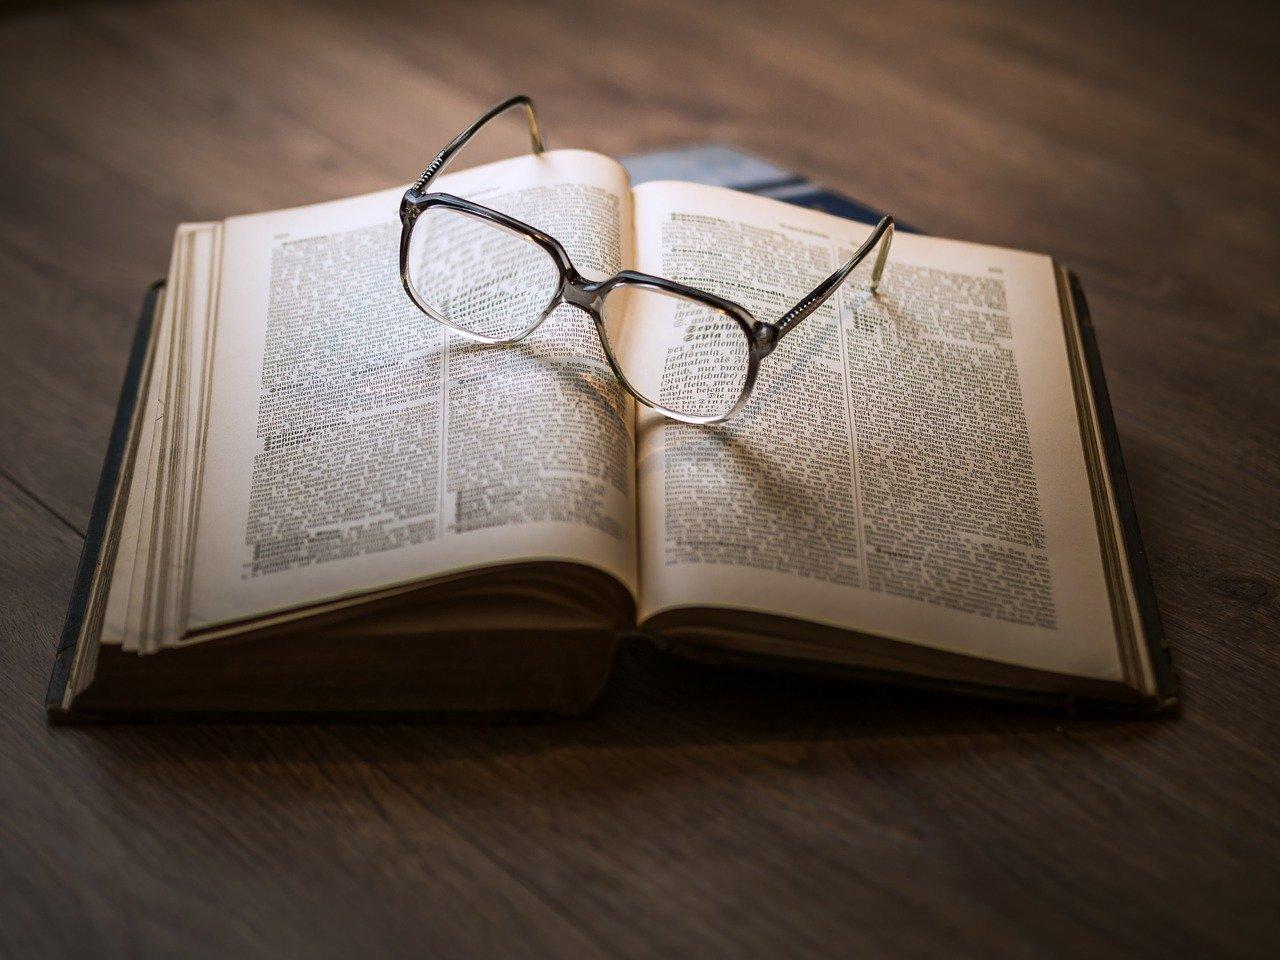 【HTML&CSS初心者におすすめしたい勉強用の本11選】と自分に合った本の選び方